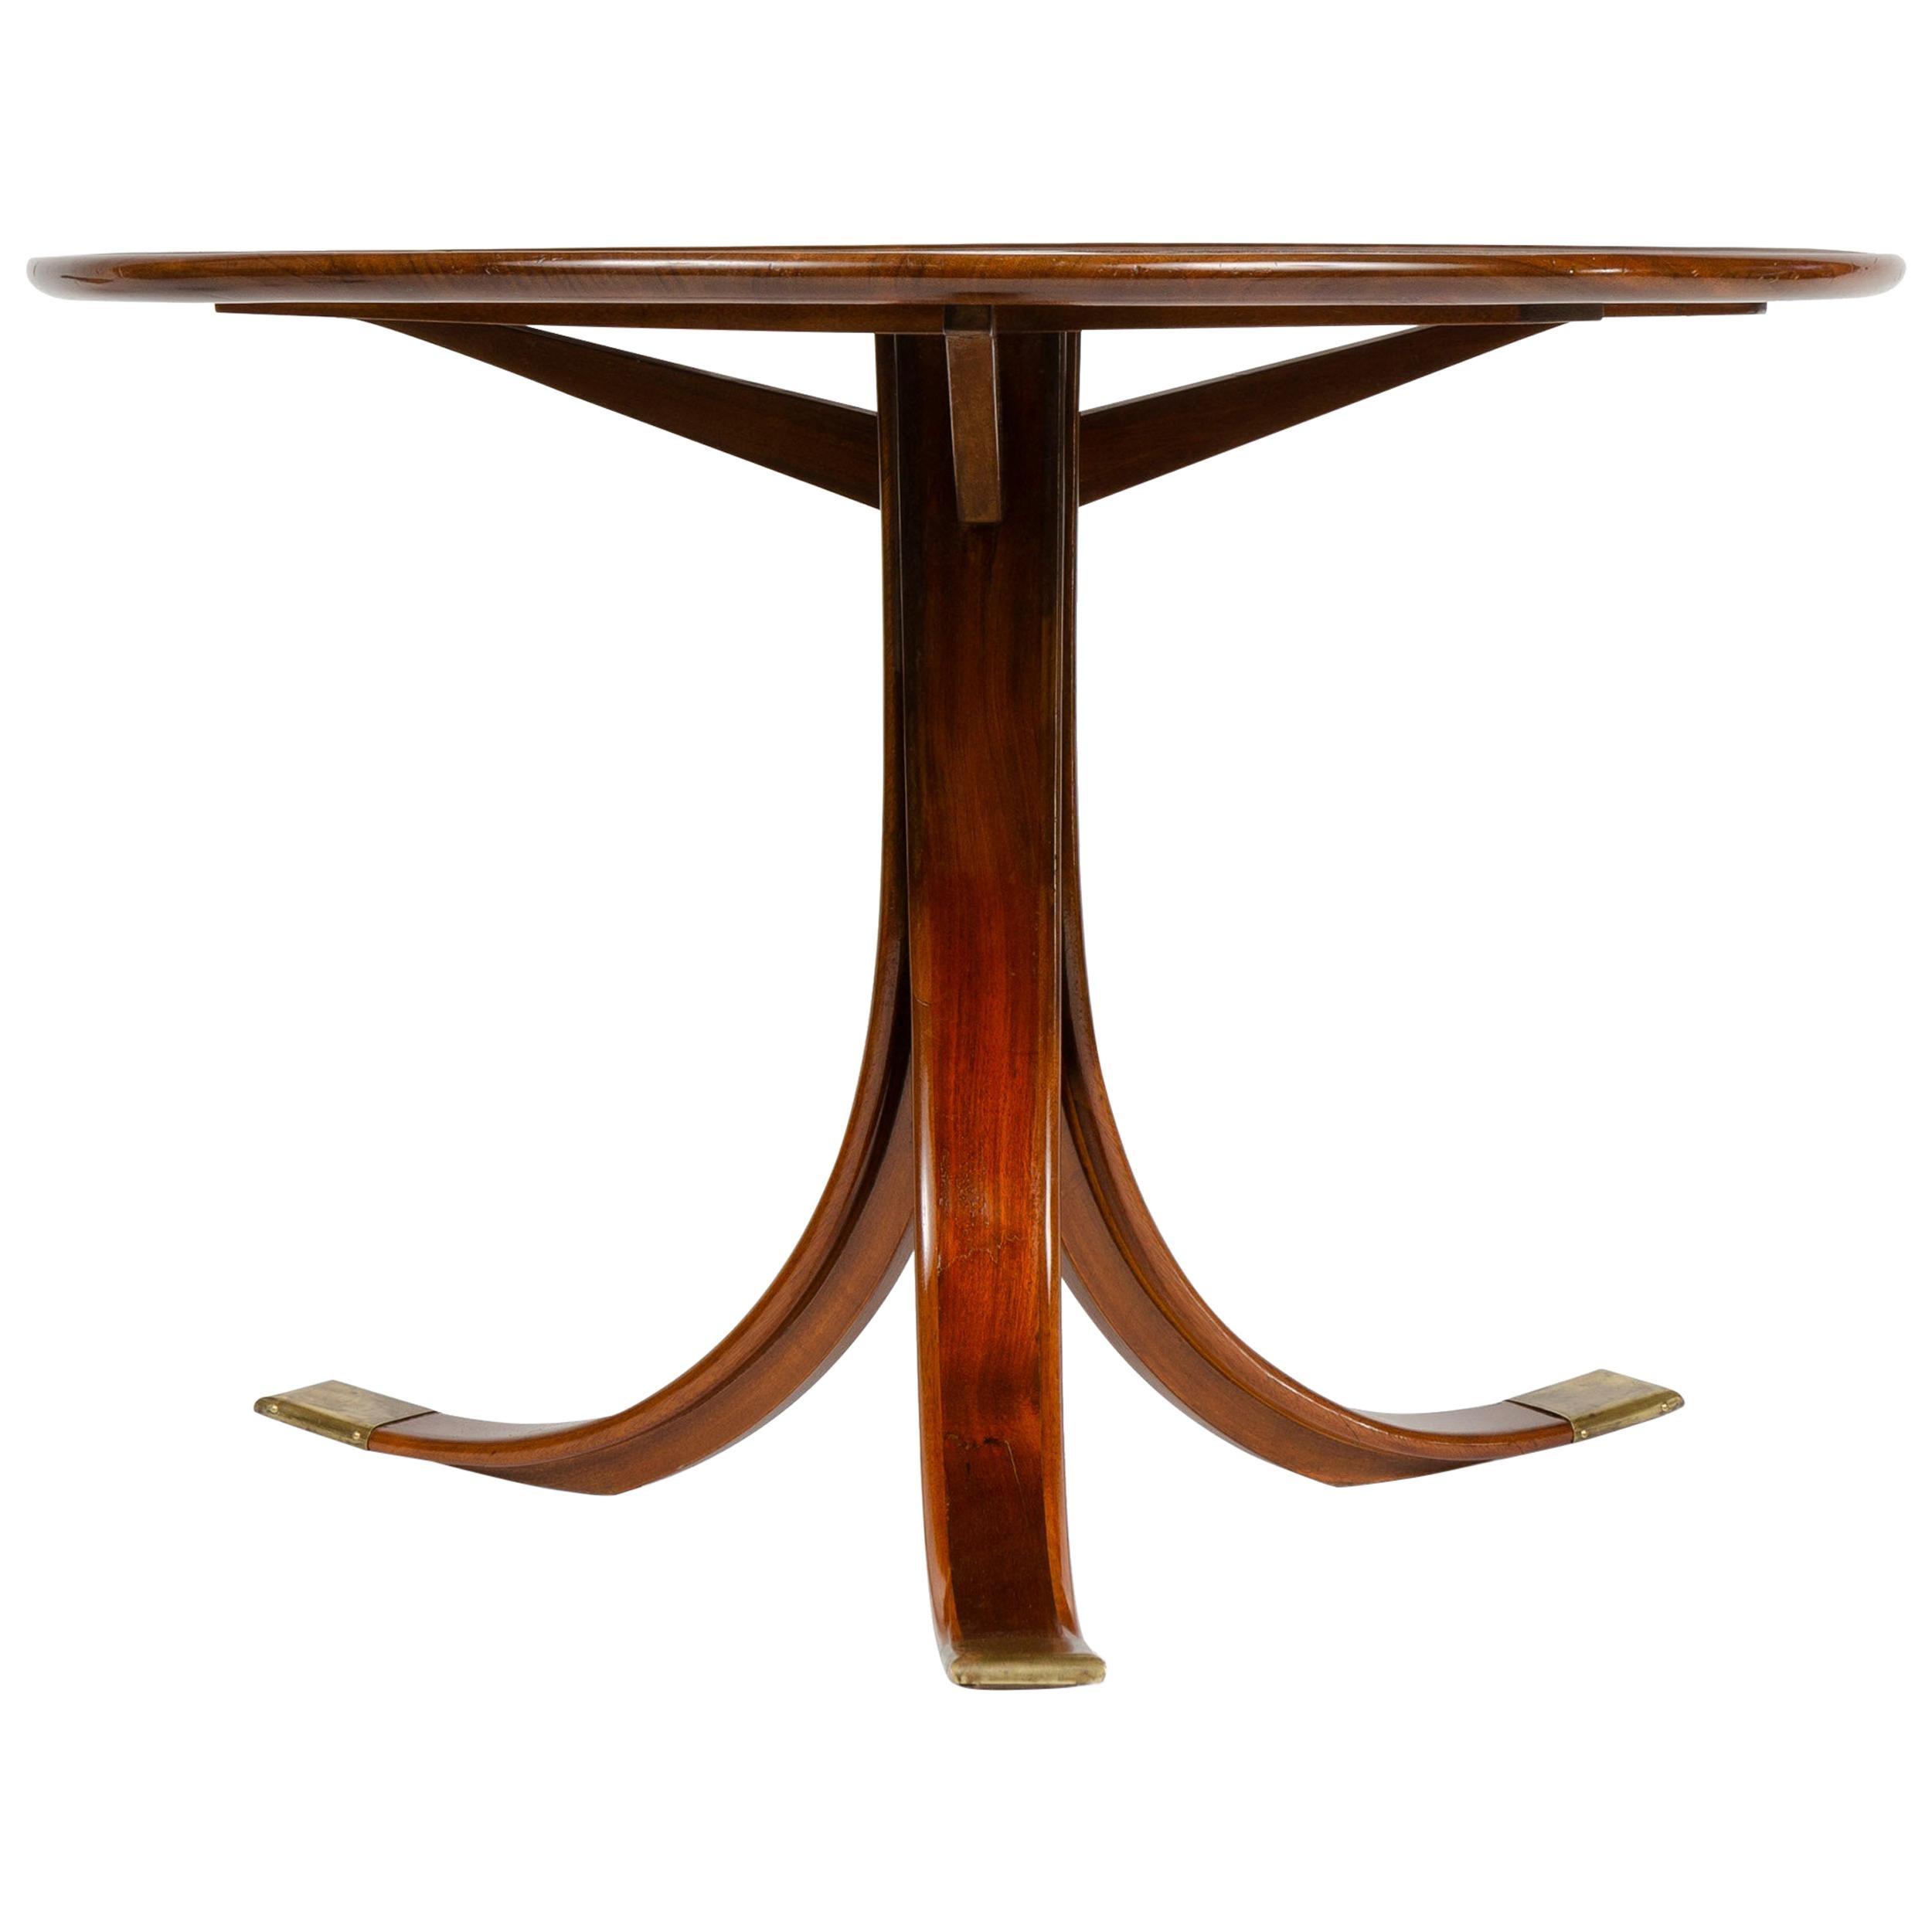 1930s Danish Circular Side Table by Frits Henningsen